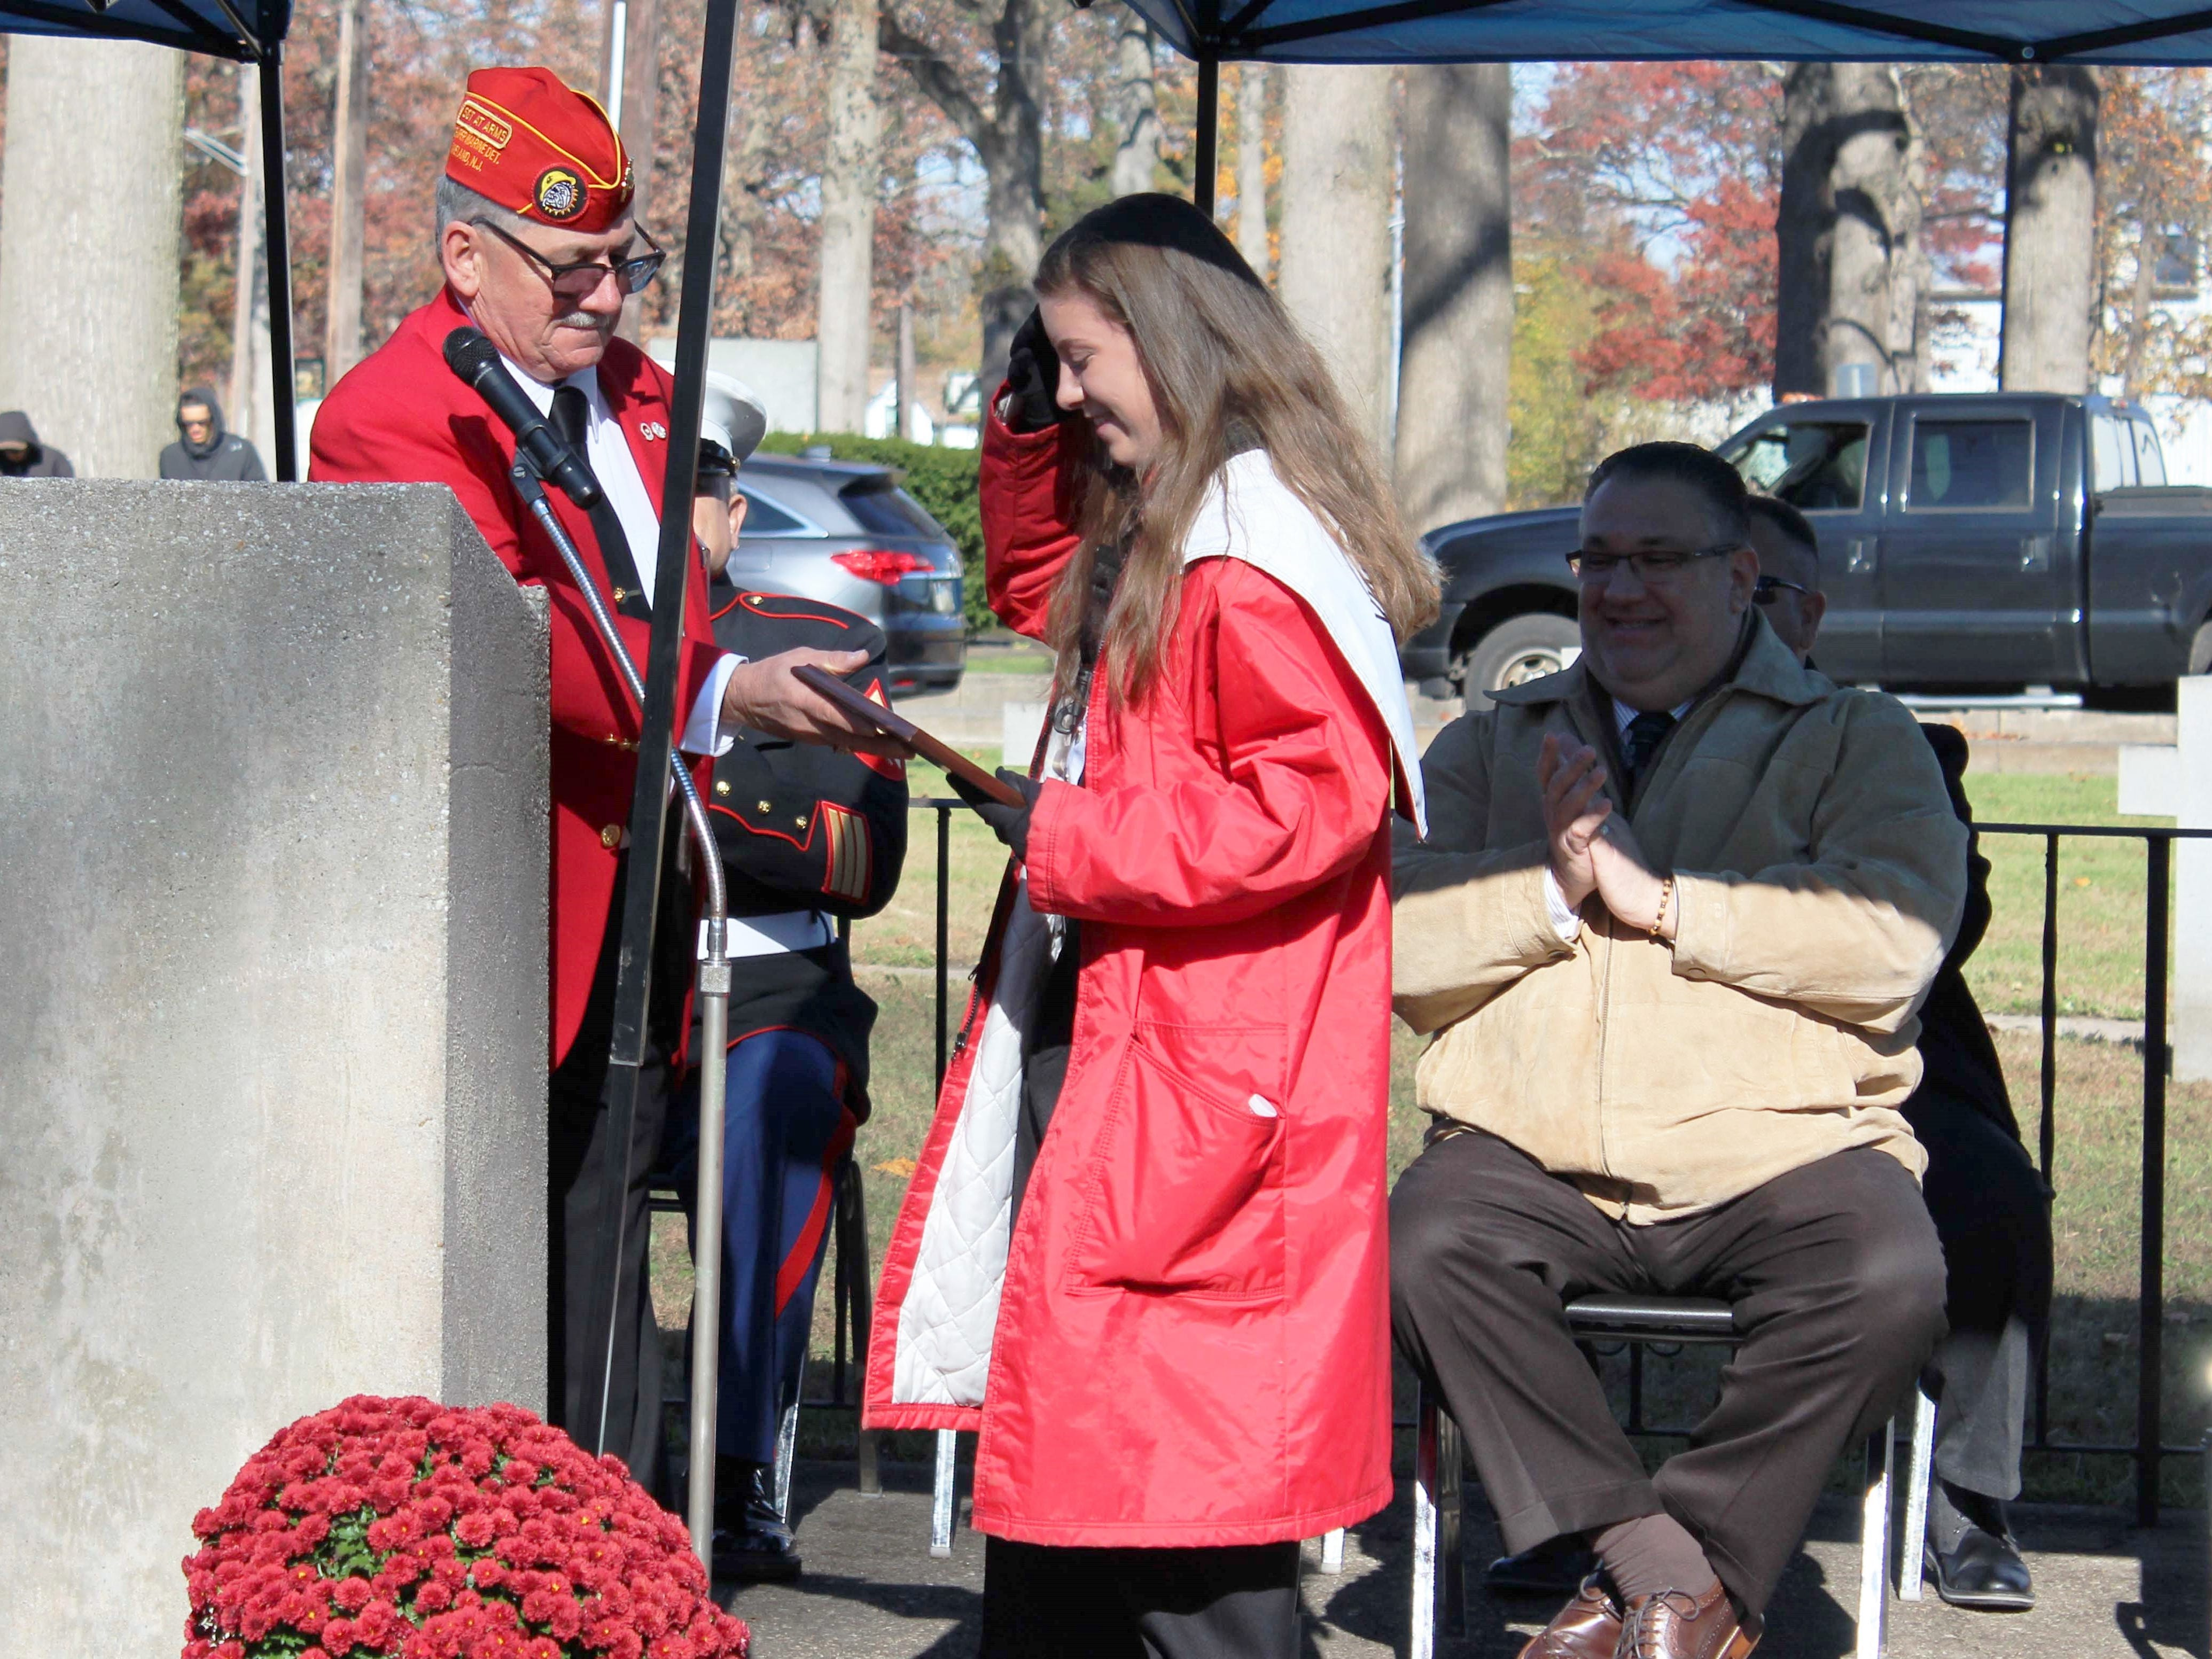 Robert Tesoroni Jr., President of the United Veterans Council of Vineland, presents Vineland High School junior, Alexandra Brodzik, with a plaque honoring her efforts for the veterans of Vineland.